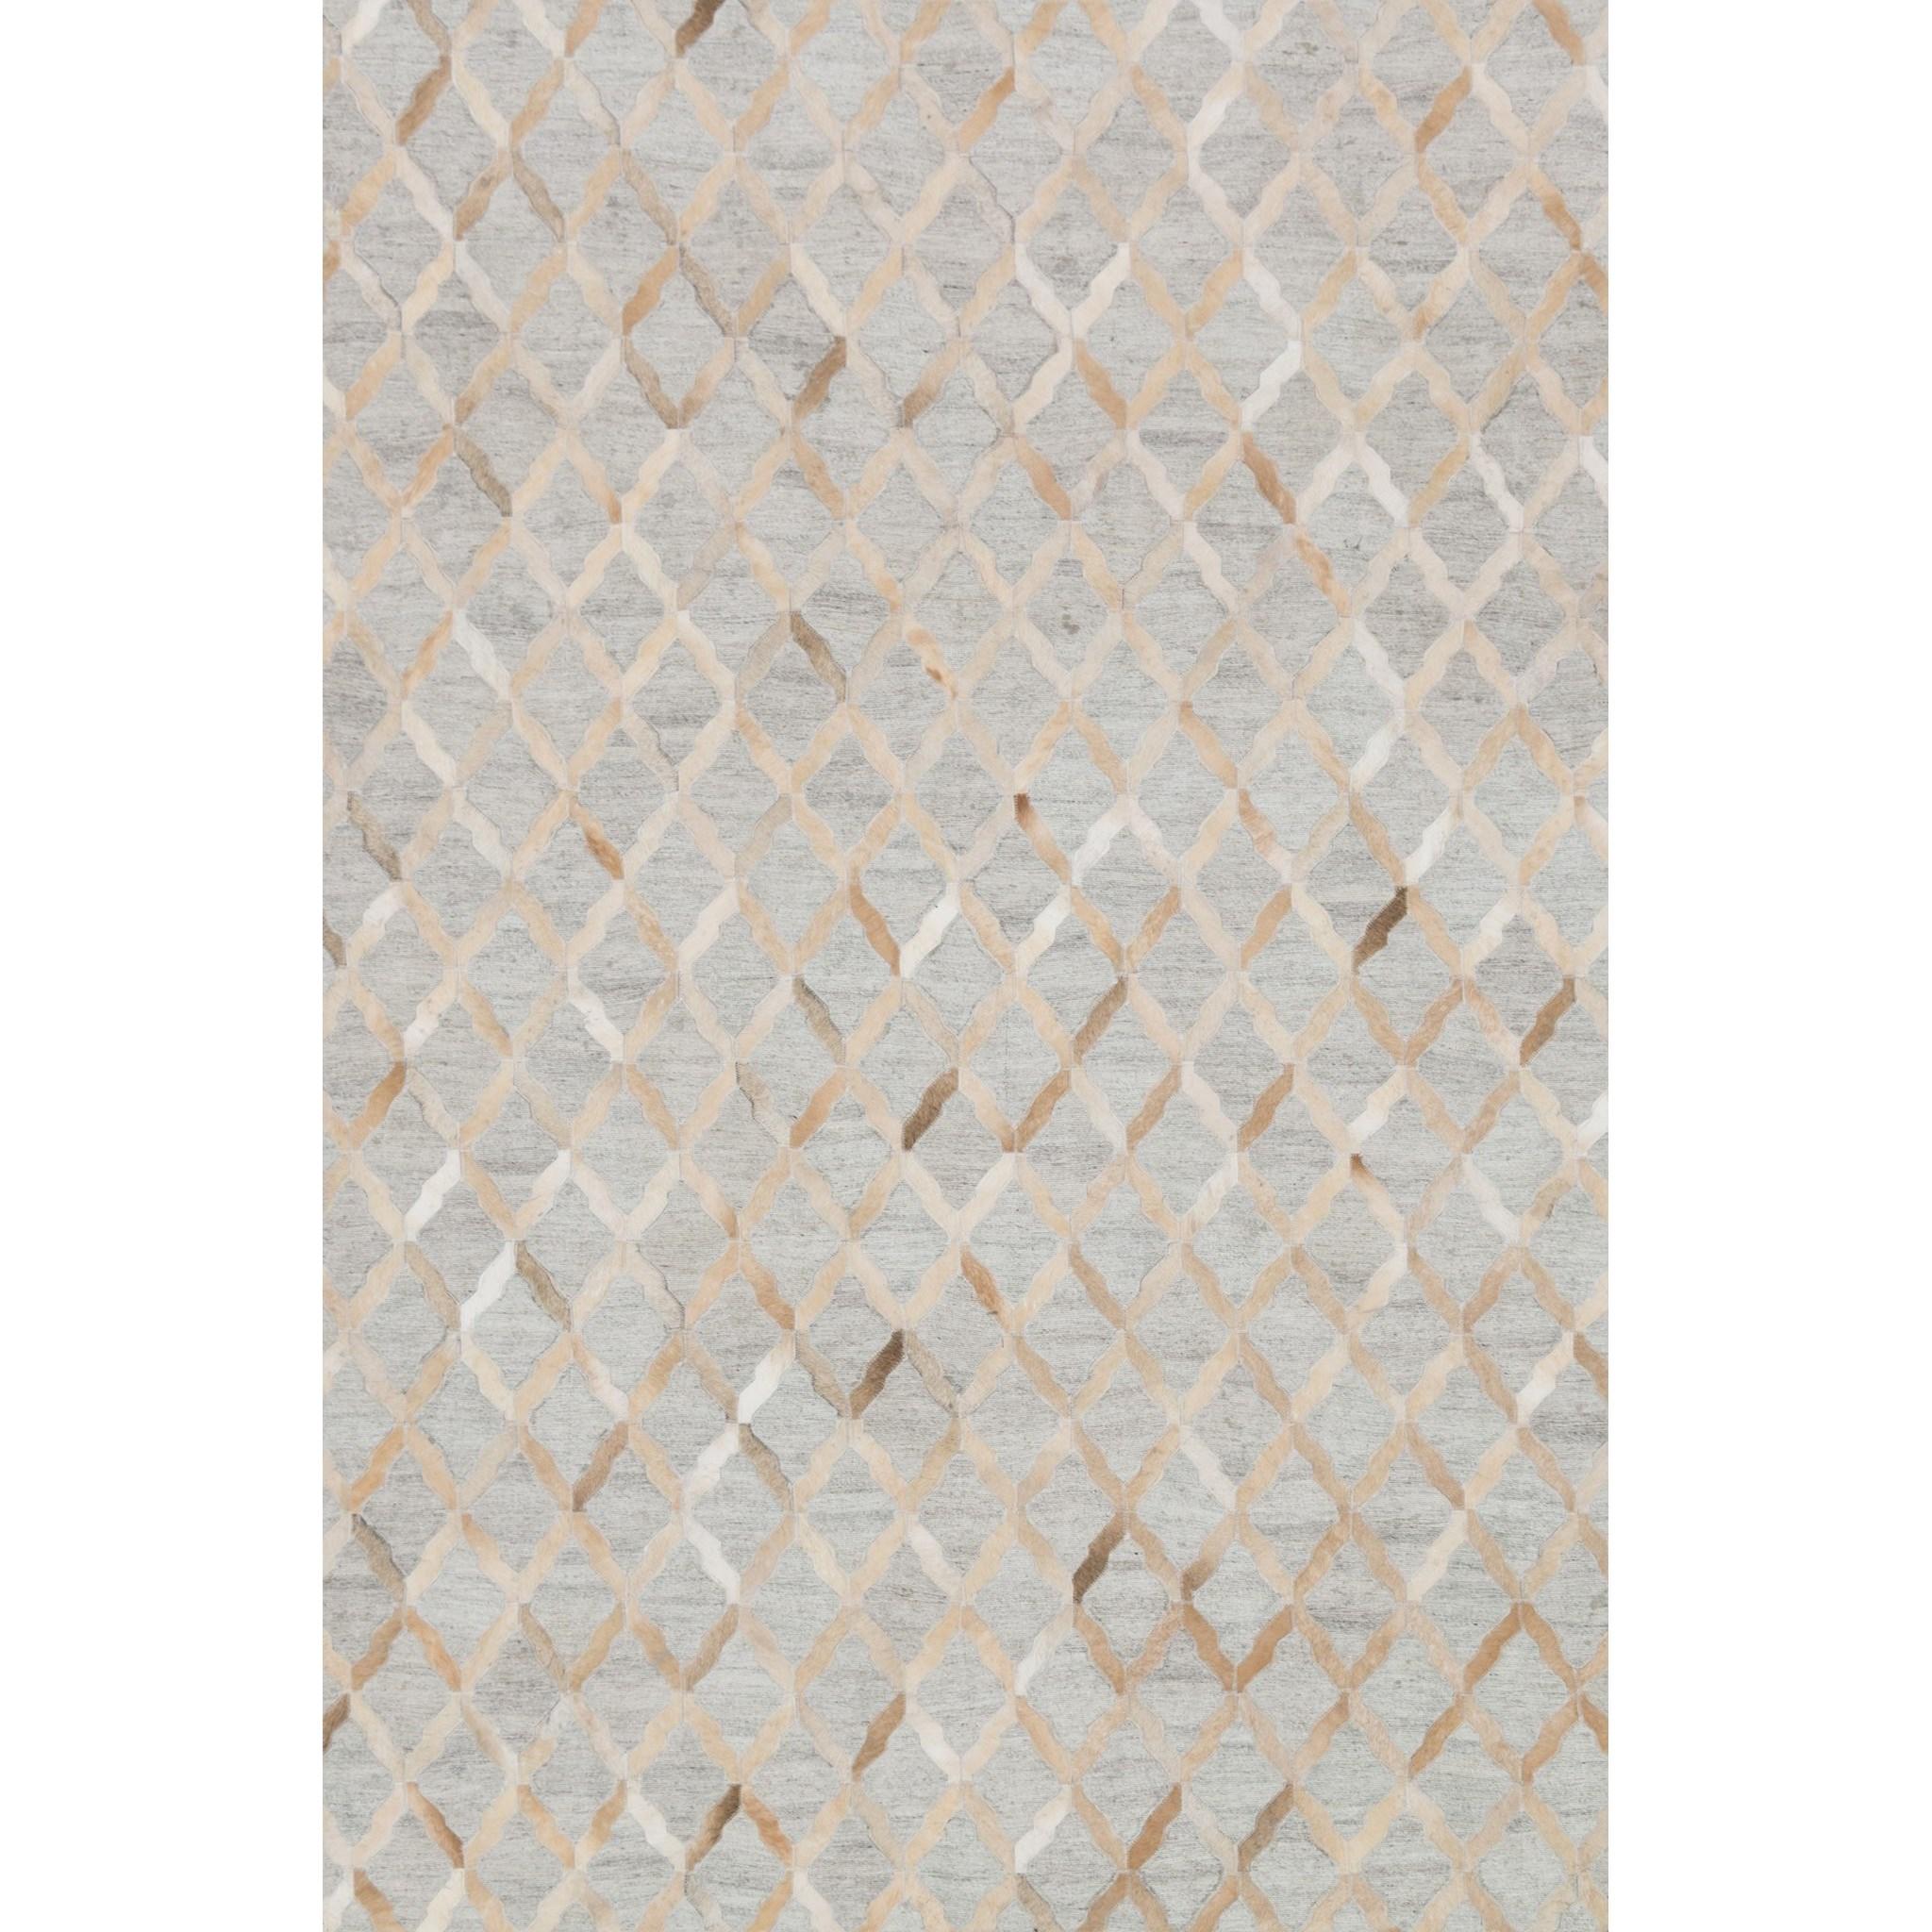 "Dorado 7'-9"" x 9'-9"" Area Rug by Loloi Rugs at Virginia Furniture Market"